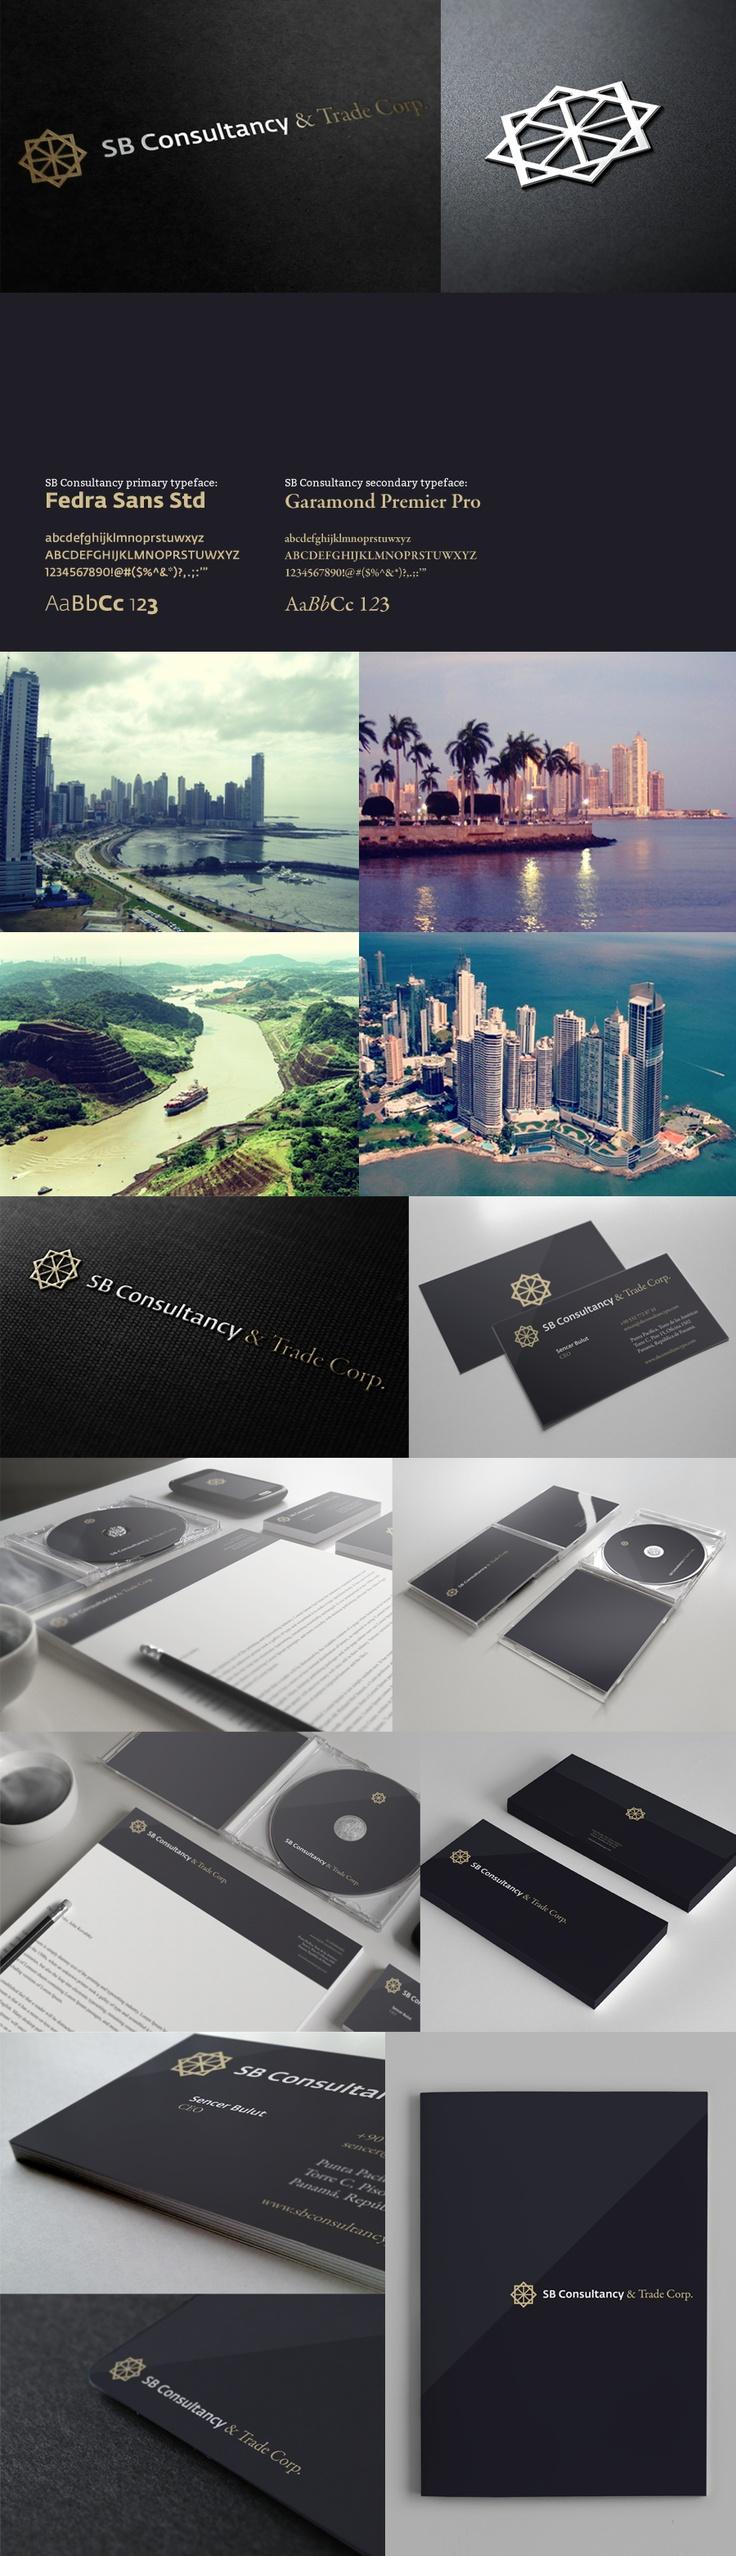 #Branding | #stationary #corporate #design #corporatedesign #identity #branding #marketing < repinned by www.BlickeDeeler.de | Visit our website: www.blickedeeler.de/leistungen/corporate-design